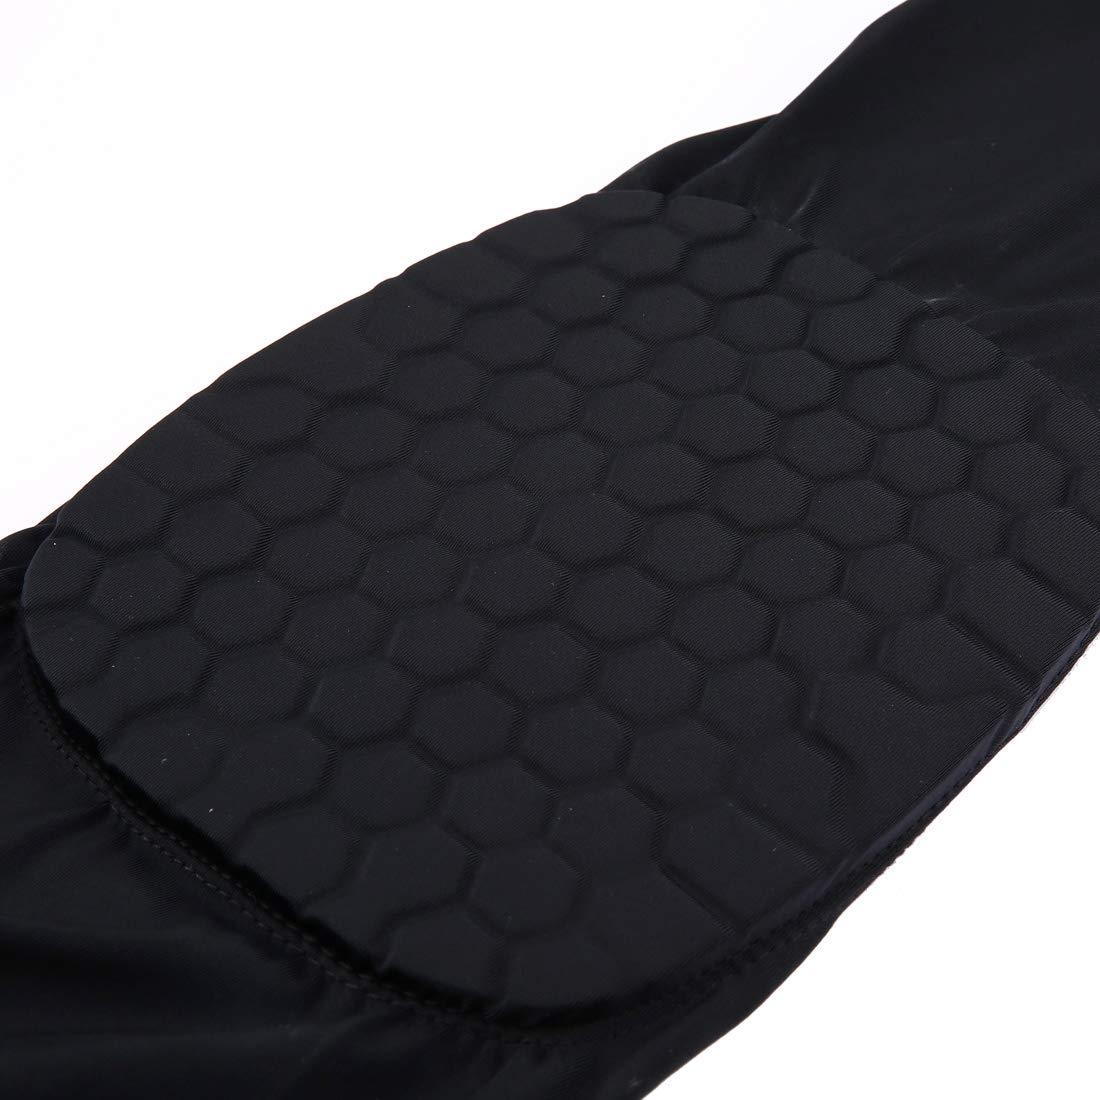 Anstorematealliance Sports&Entertainment Sports&Entertainment Factory 1 PC Beehive Shaped Sports Collision-Resistant Lycra Elastic Knee Support Guard, Long Version, Size: M(Black) (Color : Black) by Anstorematealliance (Image #3)